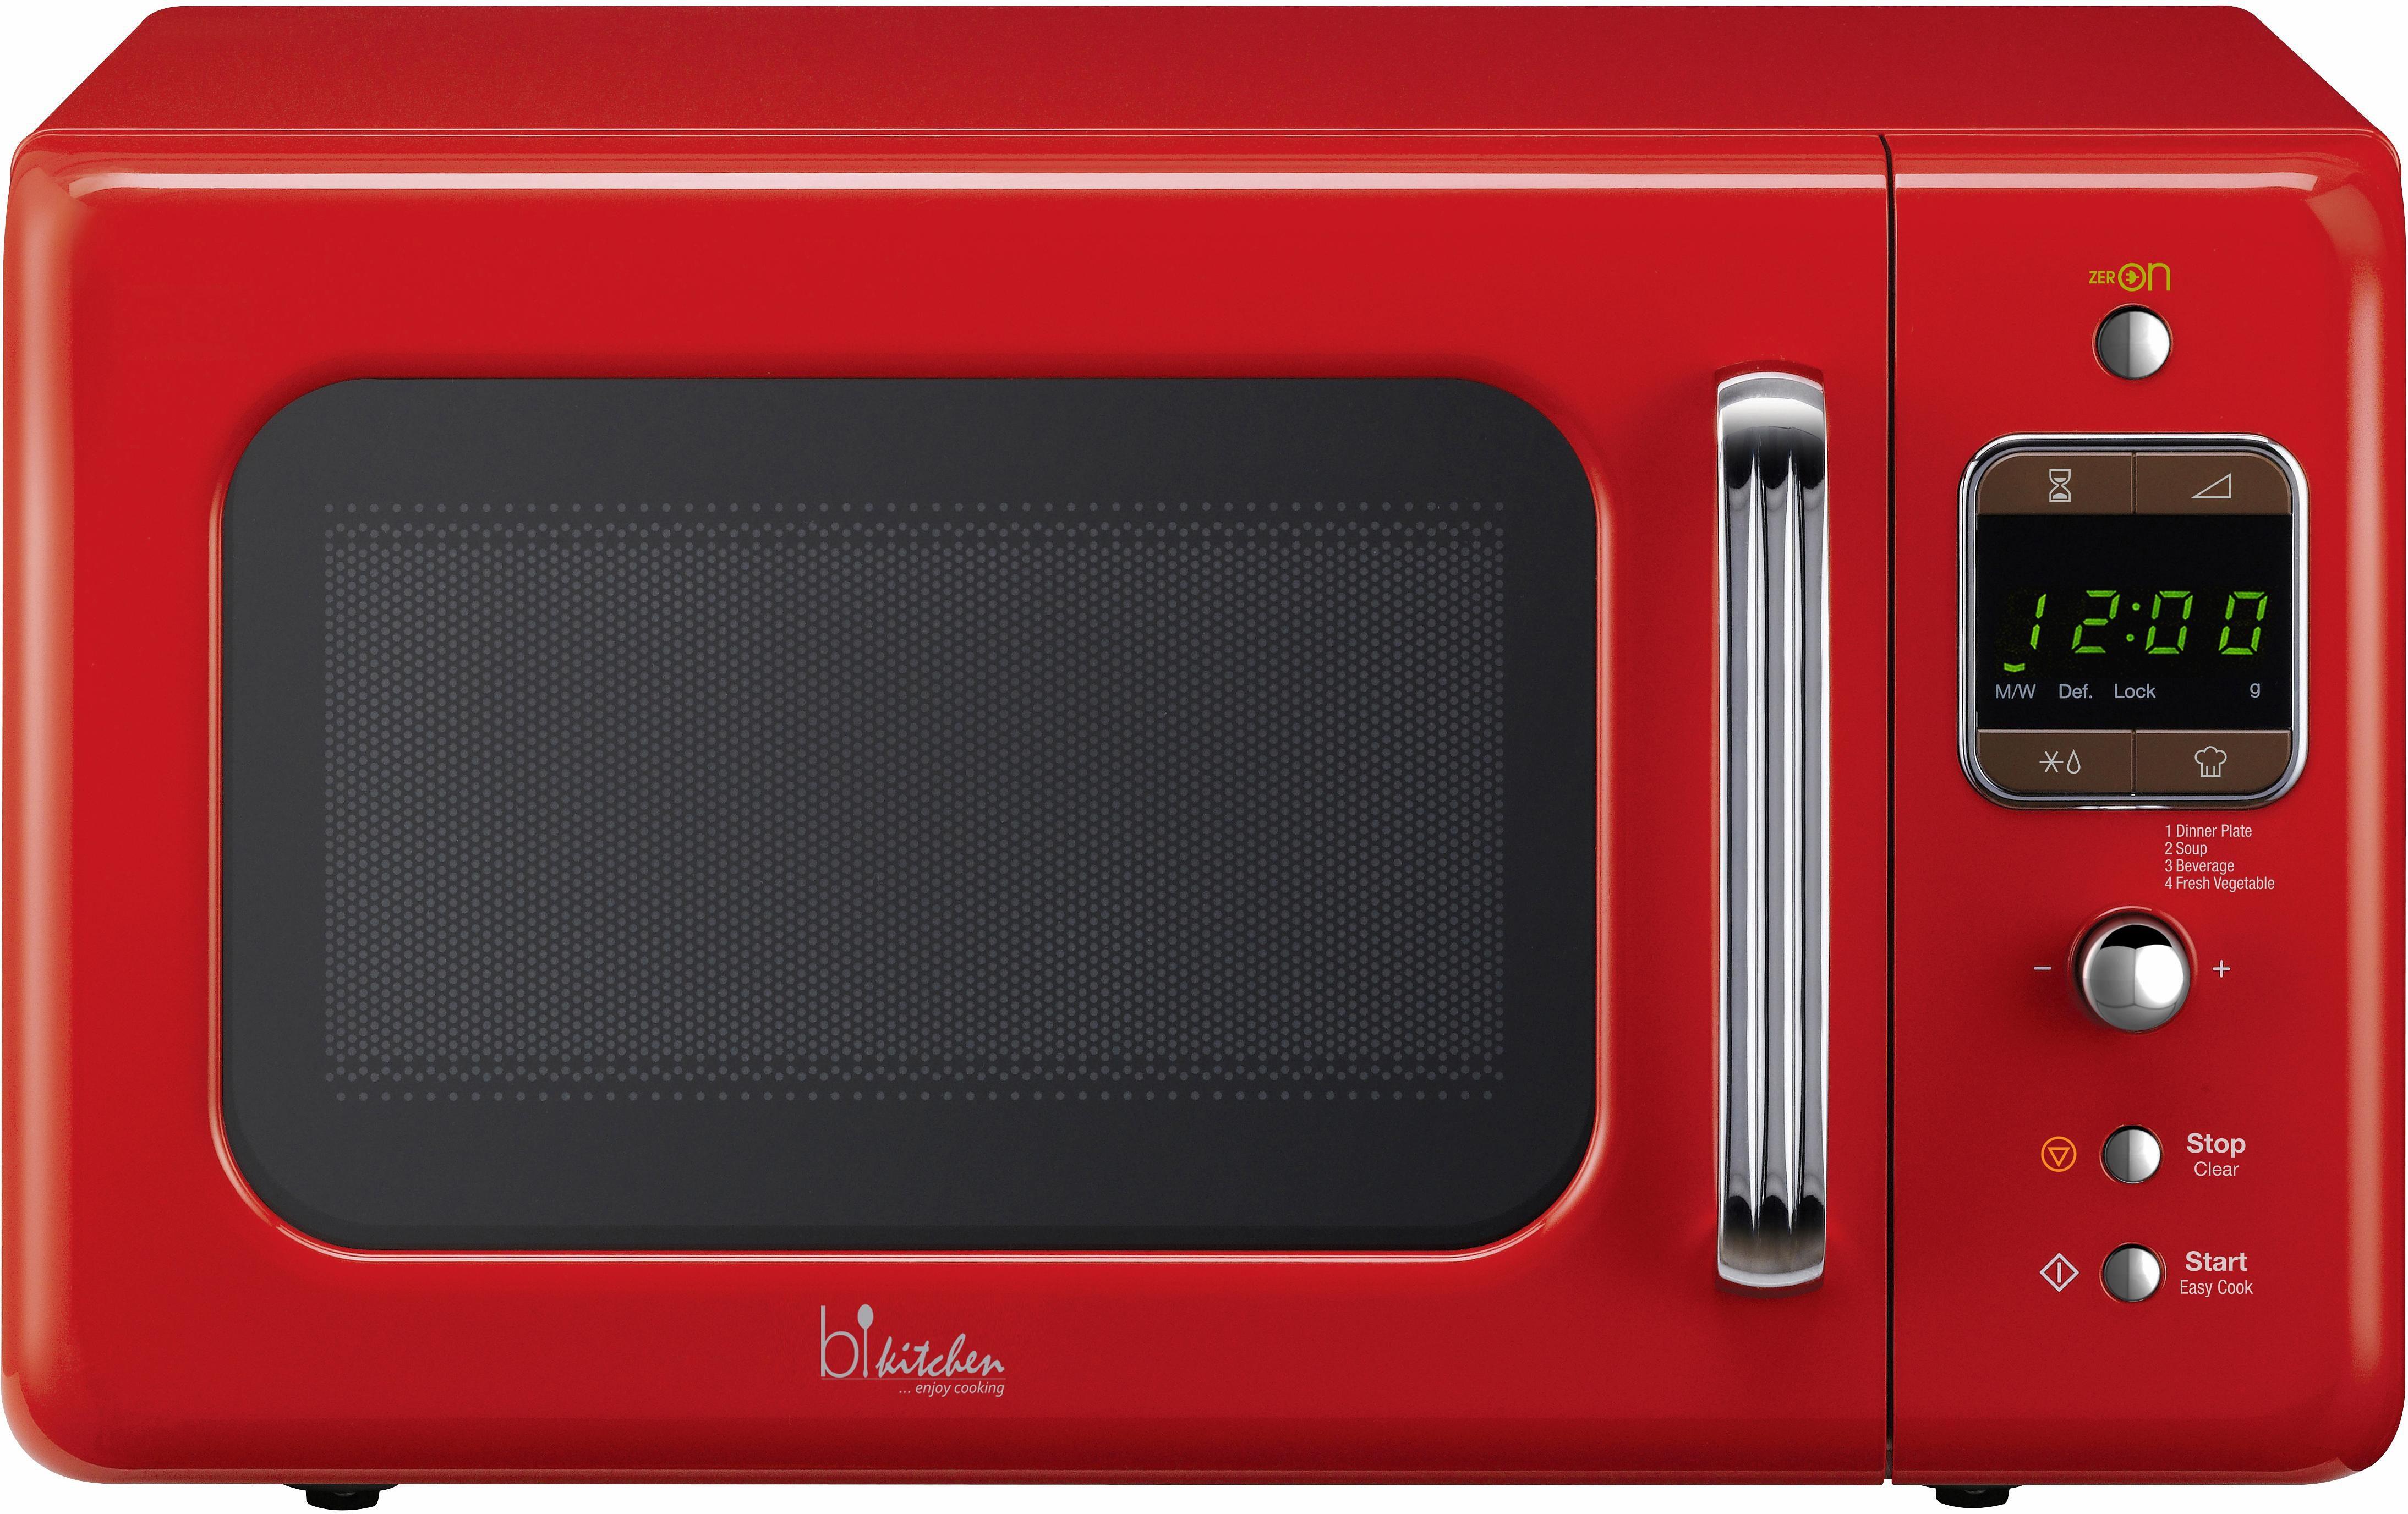 bkitchen Design Mikrowelle Cook 800, 20 Liter Garraum, 800 Watt, rot